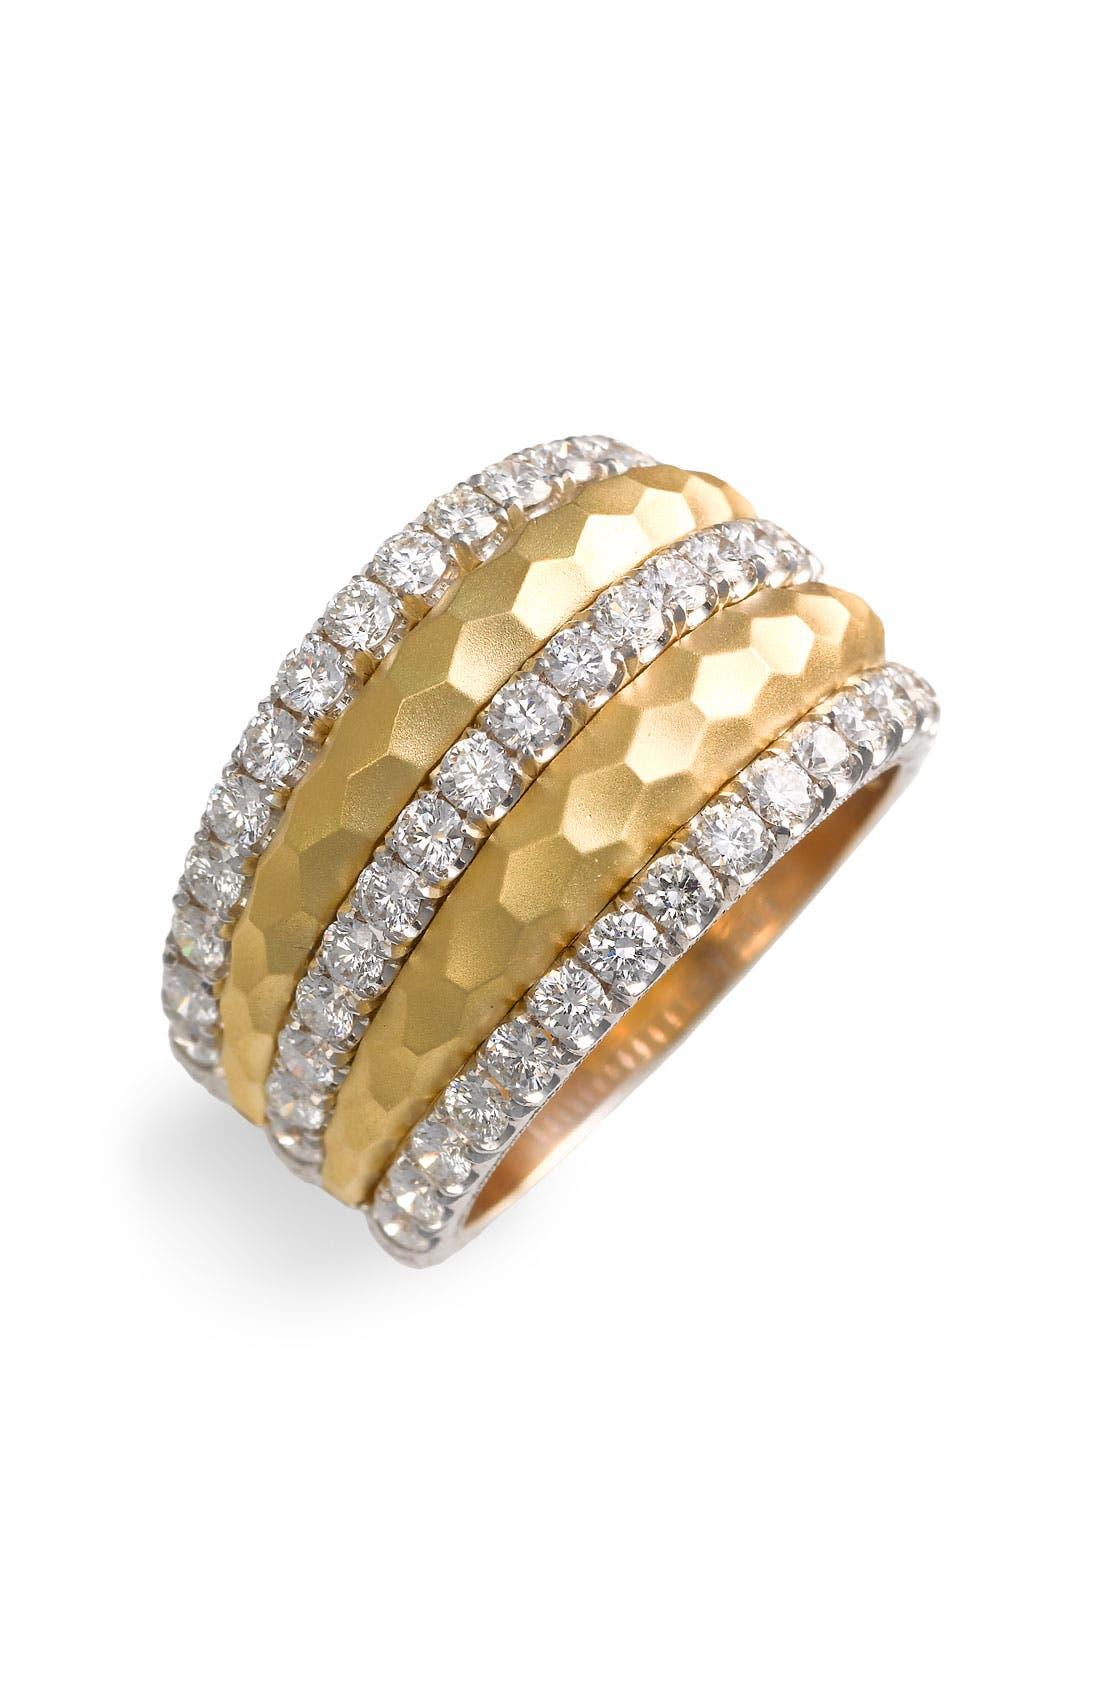 Main Image - Jack Kelége 'Byzantine' Gold & Diamond Ring